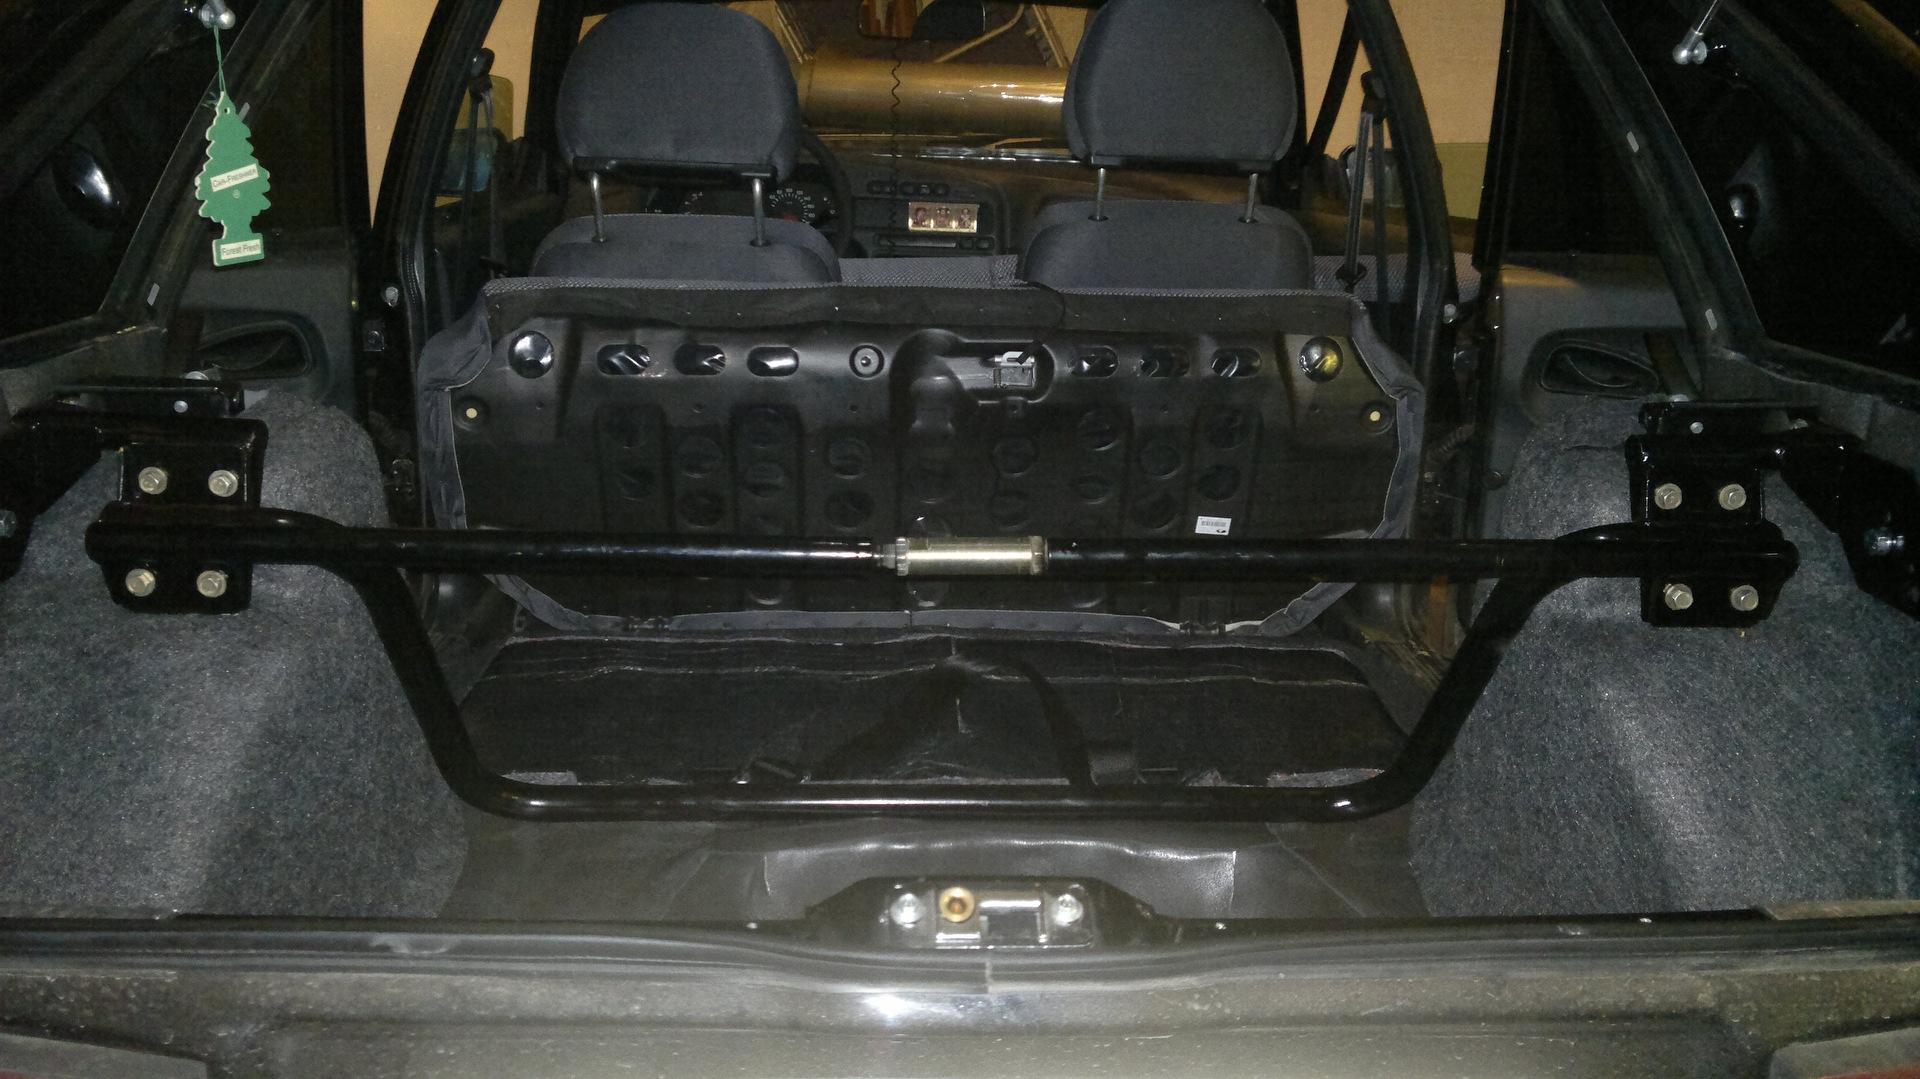 7661808s 960 - Усилитель кузова ваз 2114